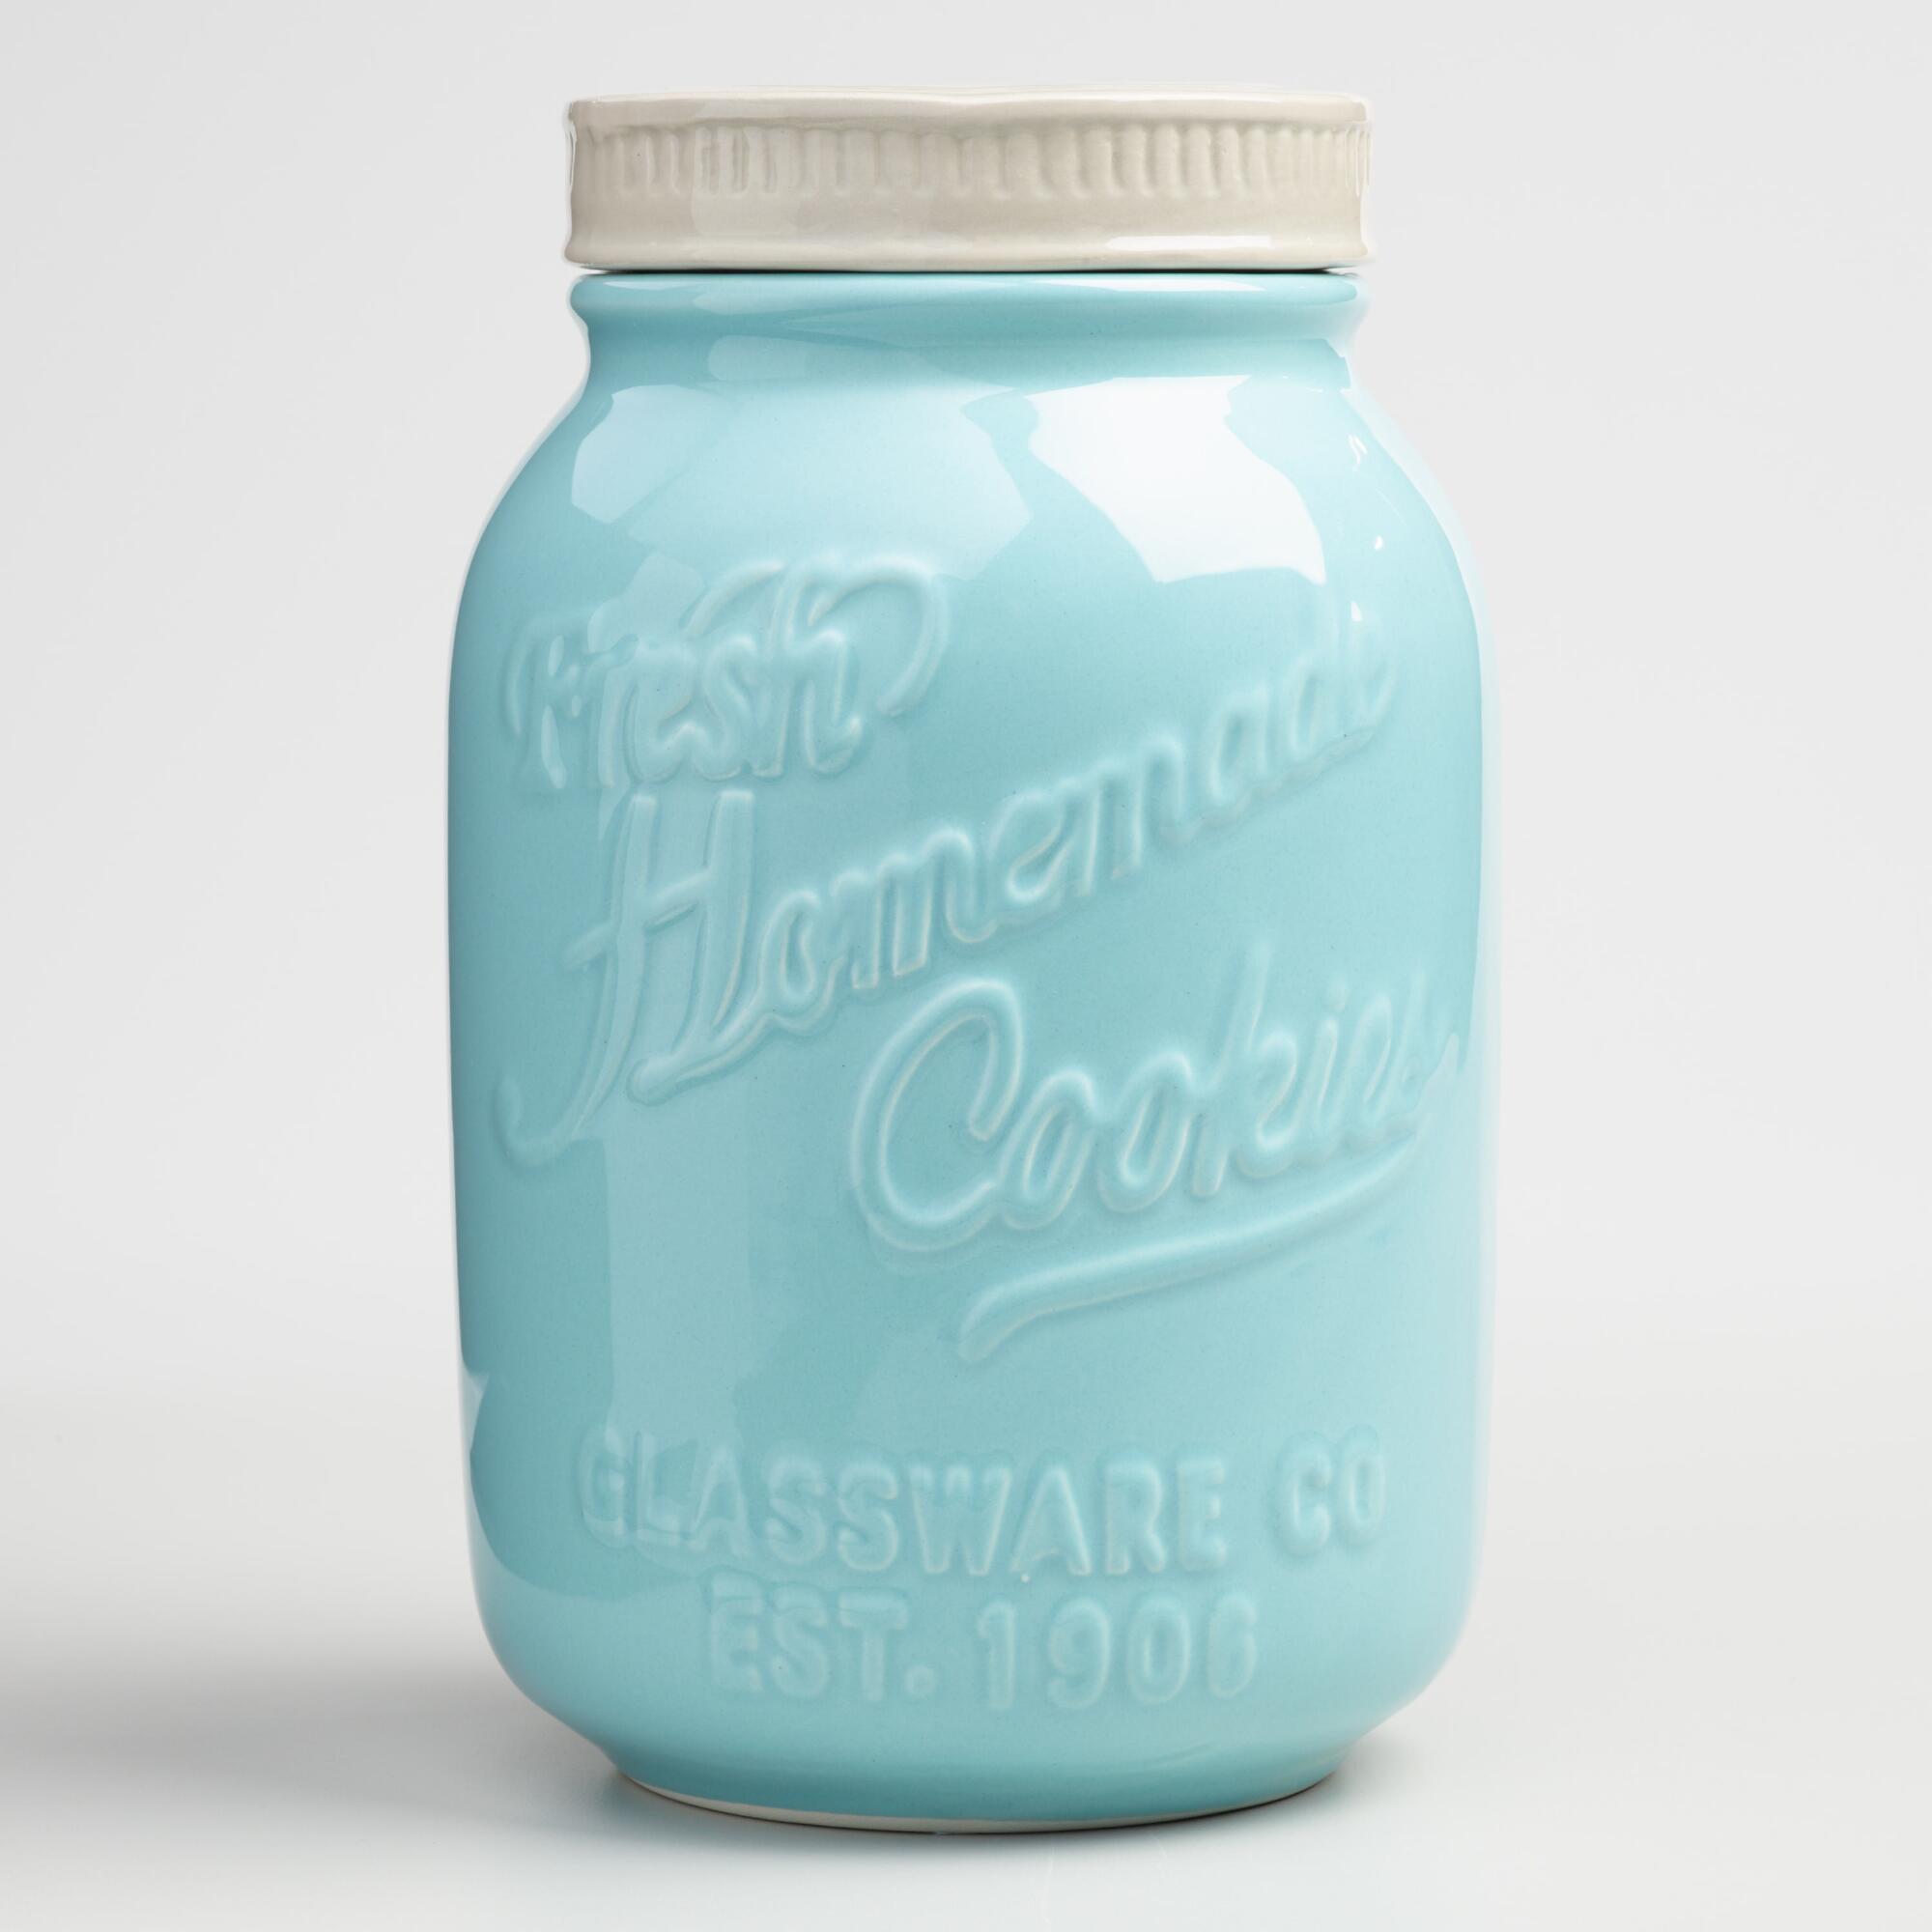 Ball jar cookie jar